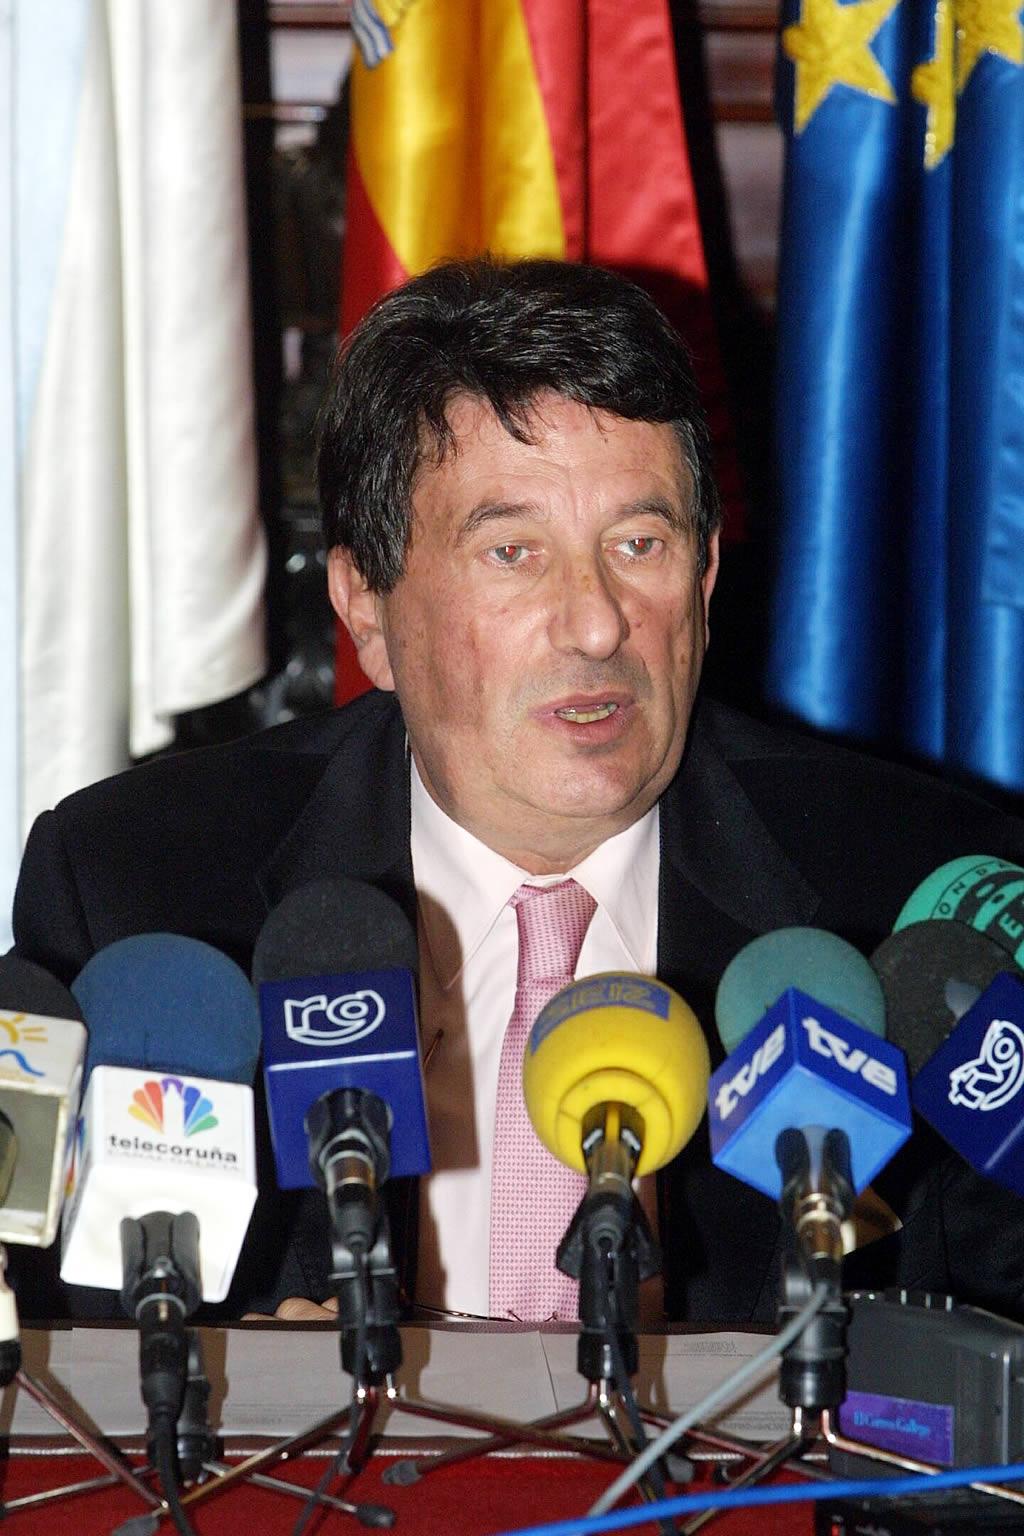 Francisco Vázquez, alcalde de A Coruña, propone quemar el buque con bombas de fósforo <br>Eduardo